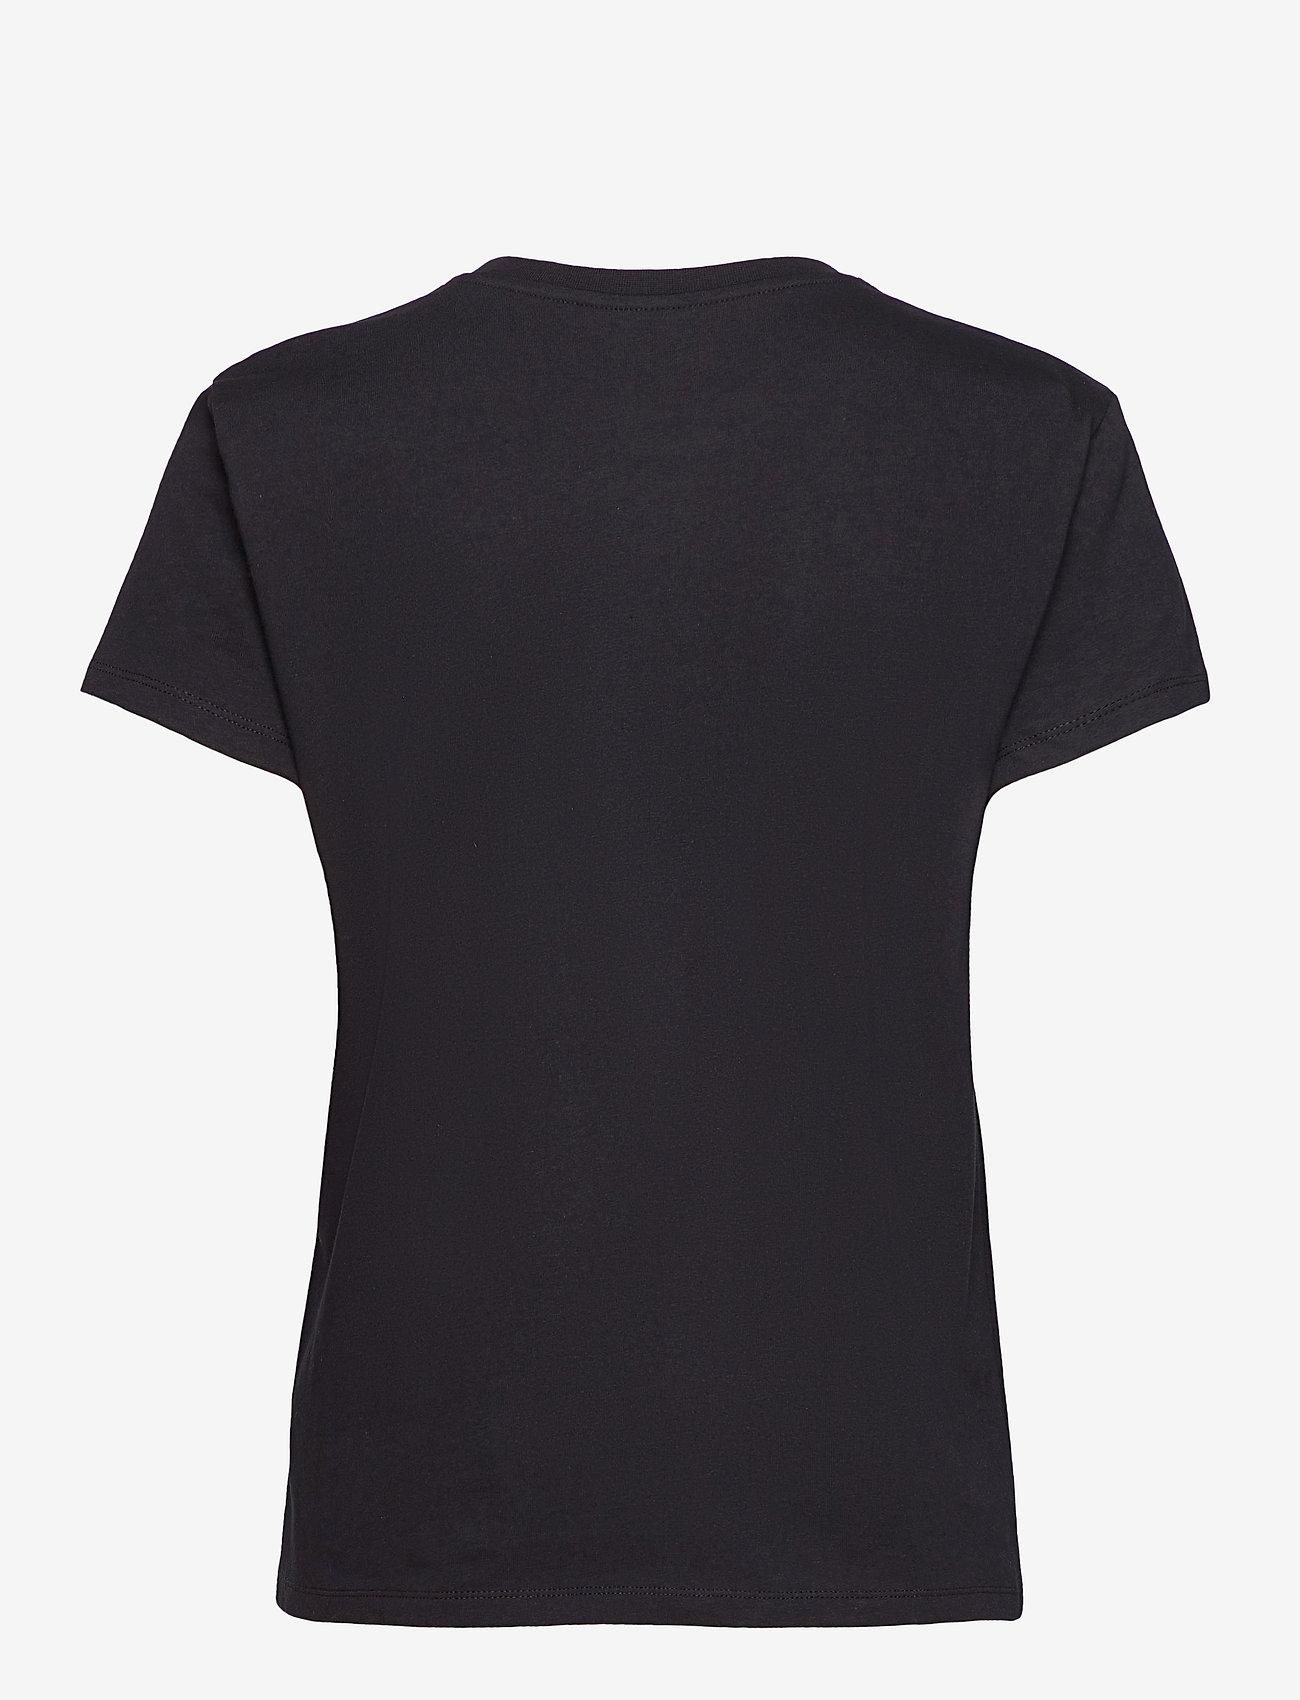 Zadig & Voltaire - ZOE PHOTOPRINT PRINTED T-SHIRT - t-shirts - black - 2